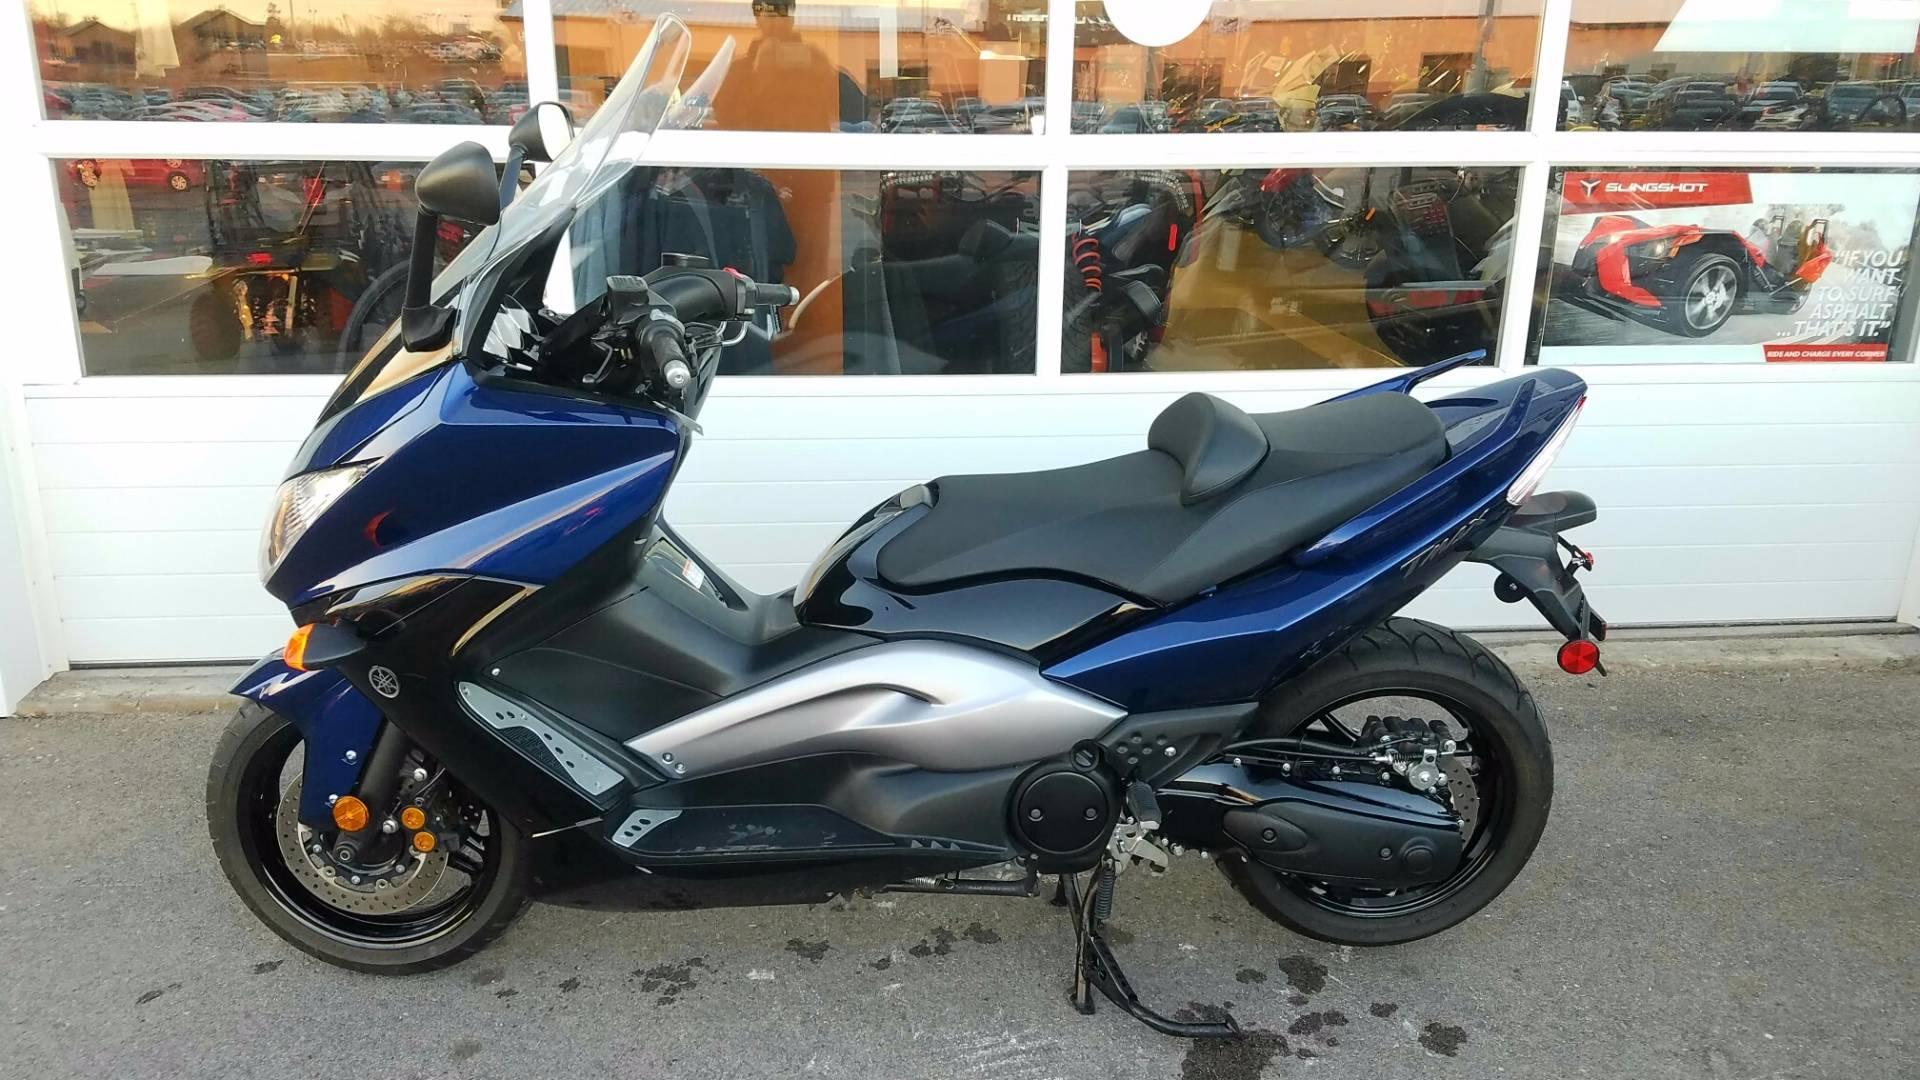 2009 yamaha tmax for sale rapid city sd 593673 for Yamaha rapid city sd